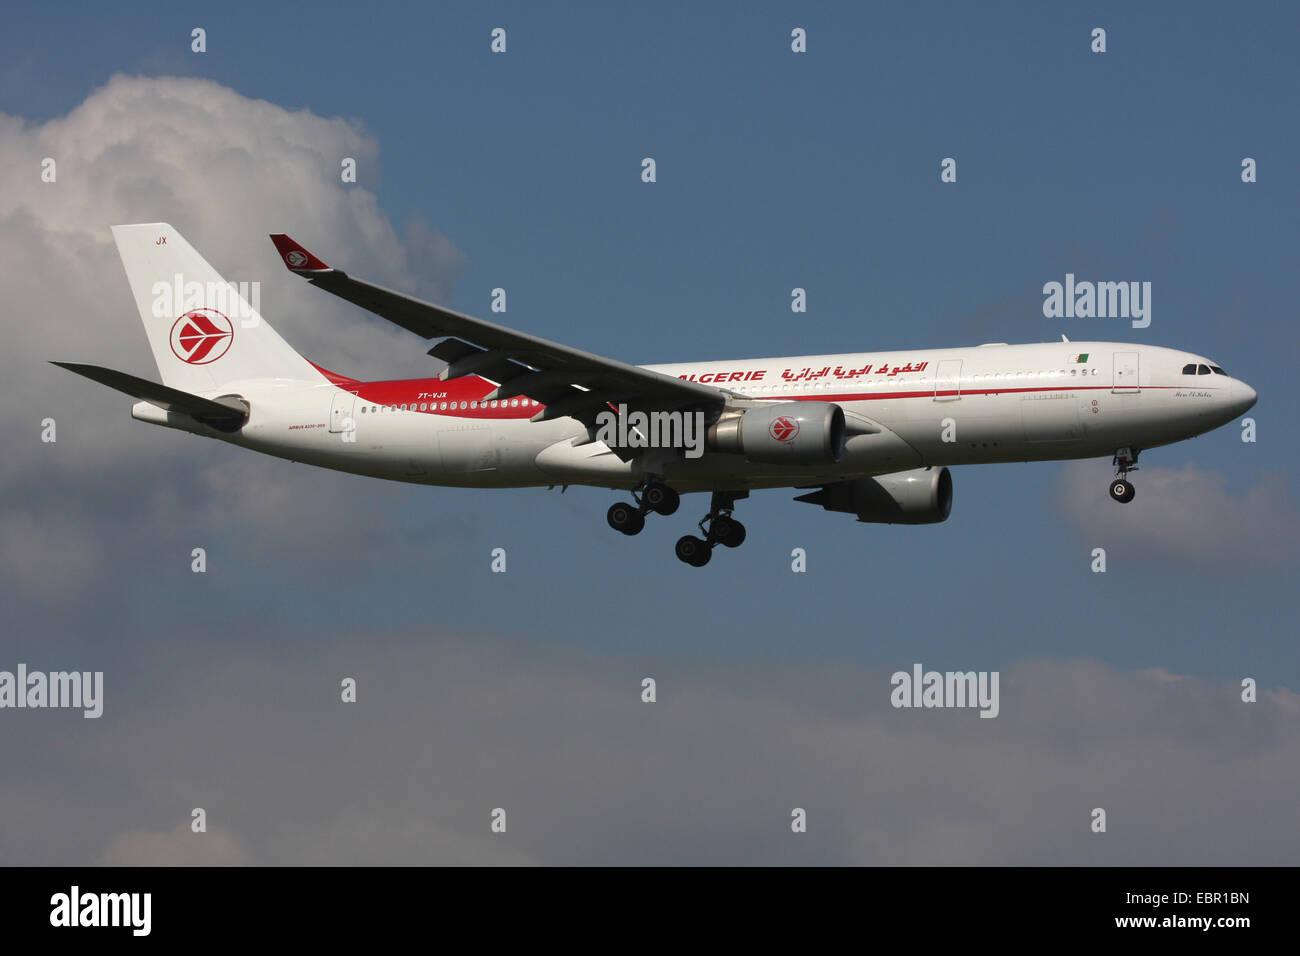 AIR ALGERIE ARGELIA A330 Imagen De Stock